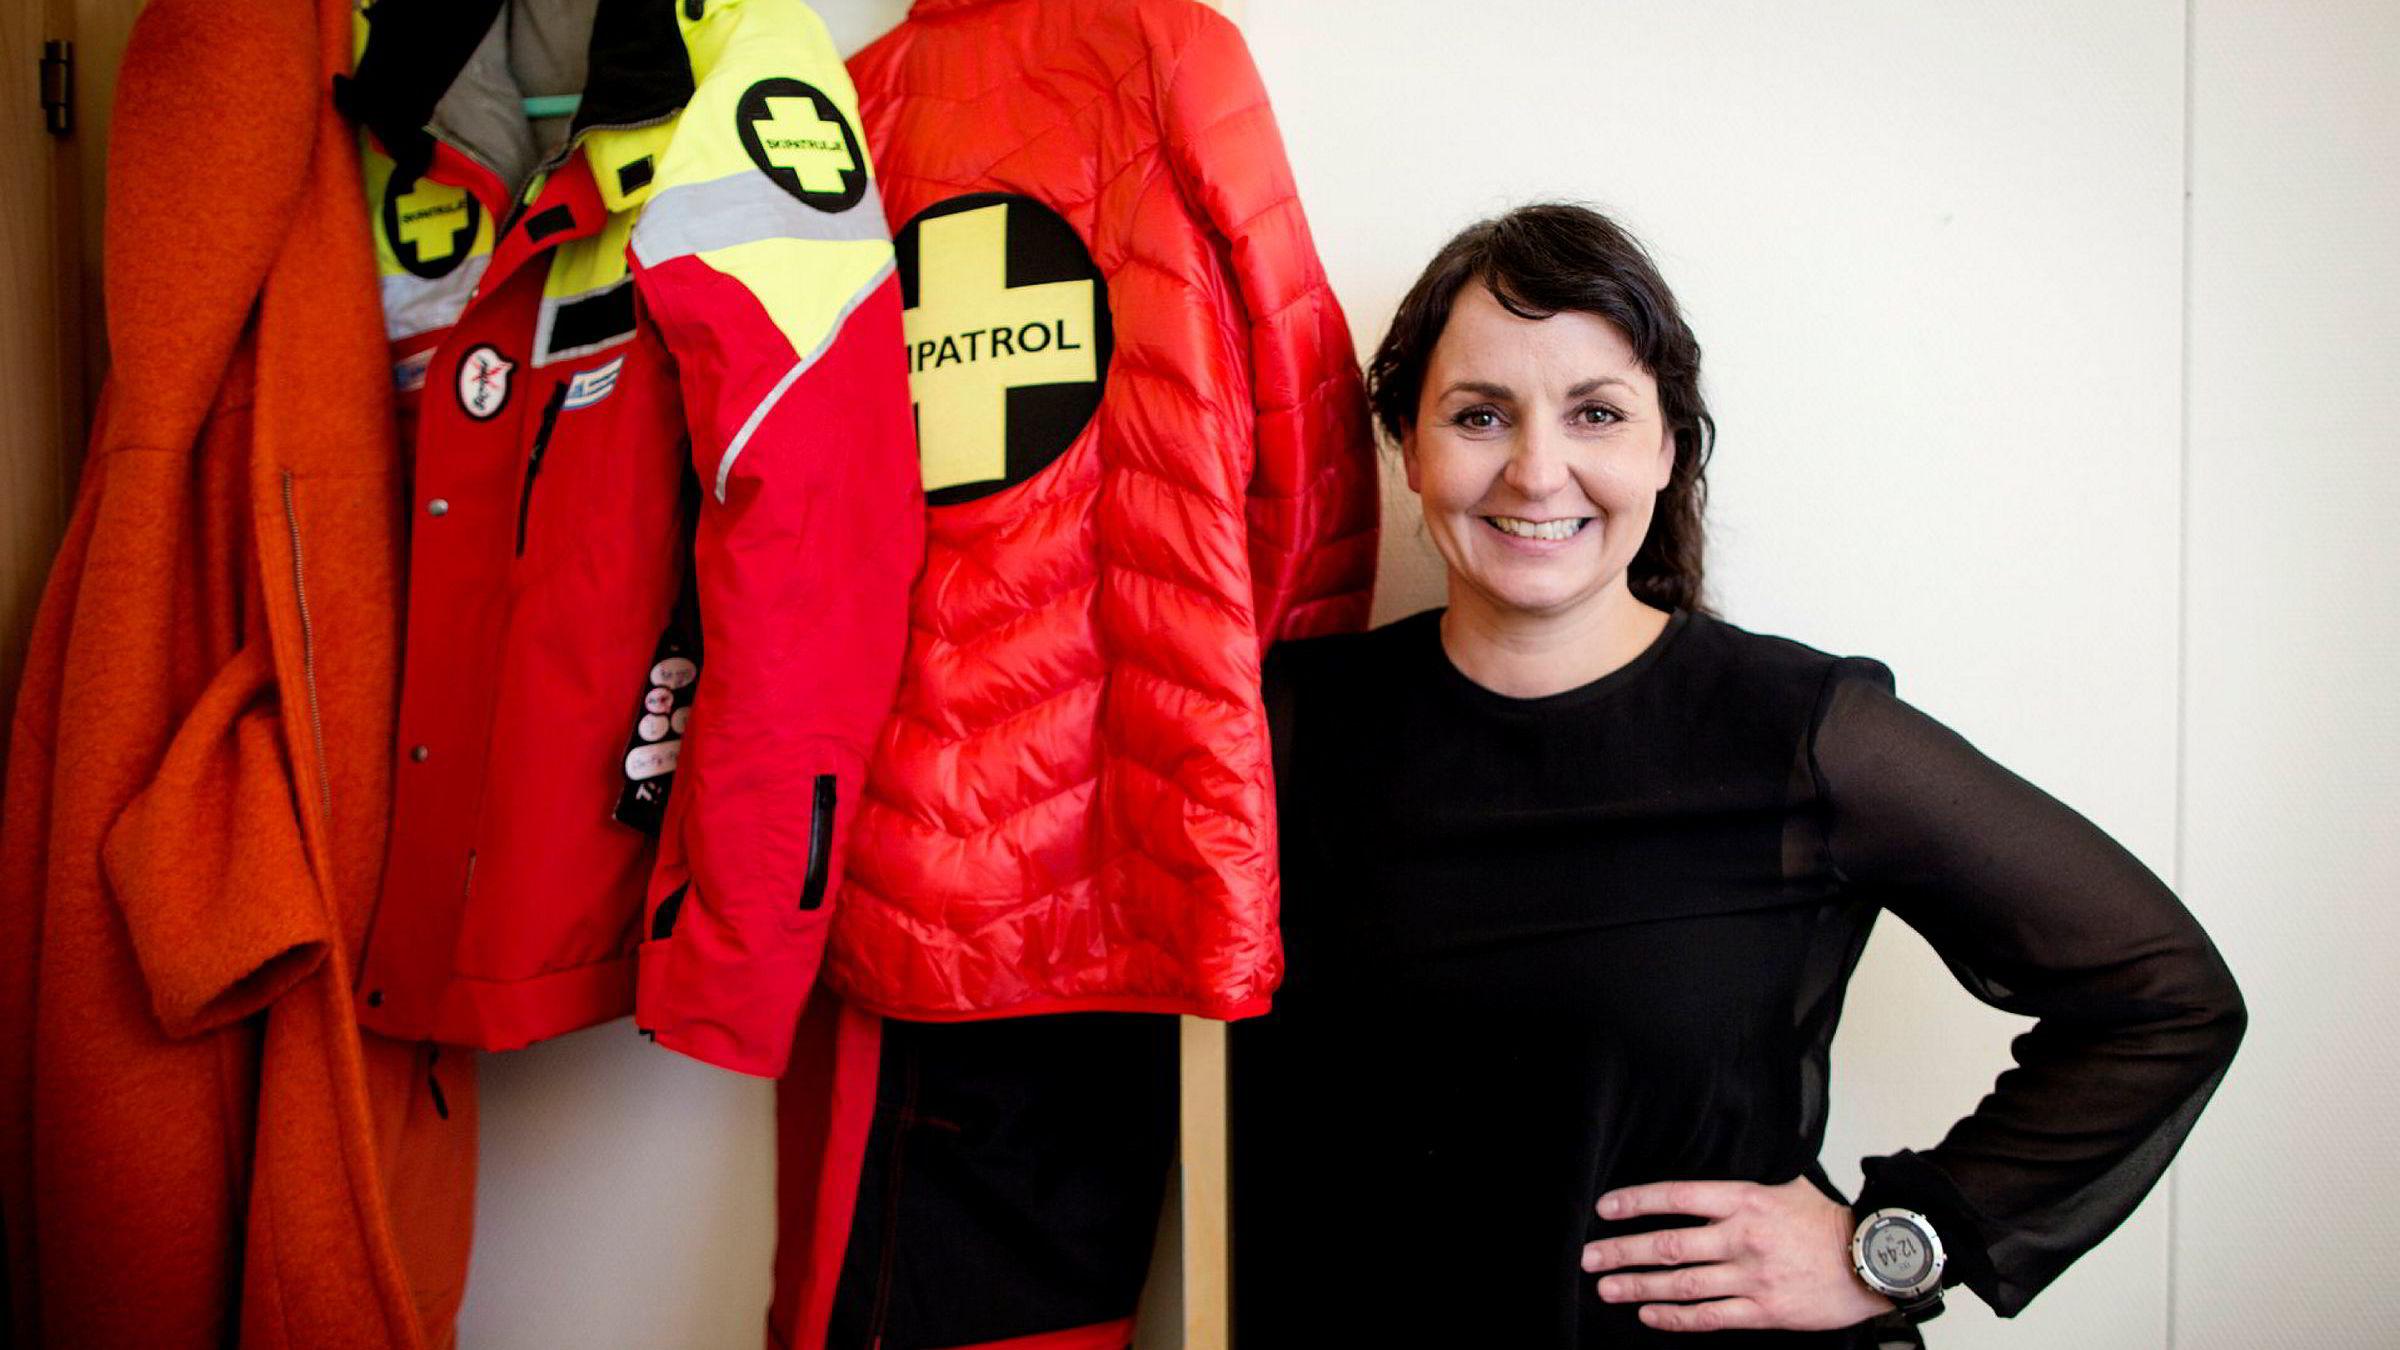 Generalsekretær i Alpinanleggenes Landsforening, Camilla Sylling Clausen, er positivt overrasket over inntektsøkningen i alpinanleggene så langt i vinter.